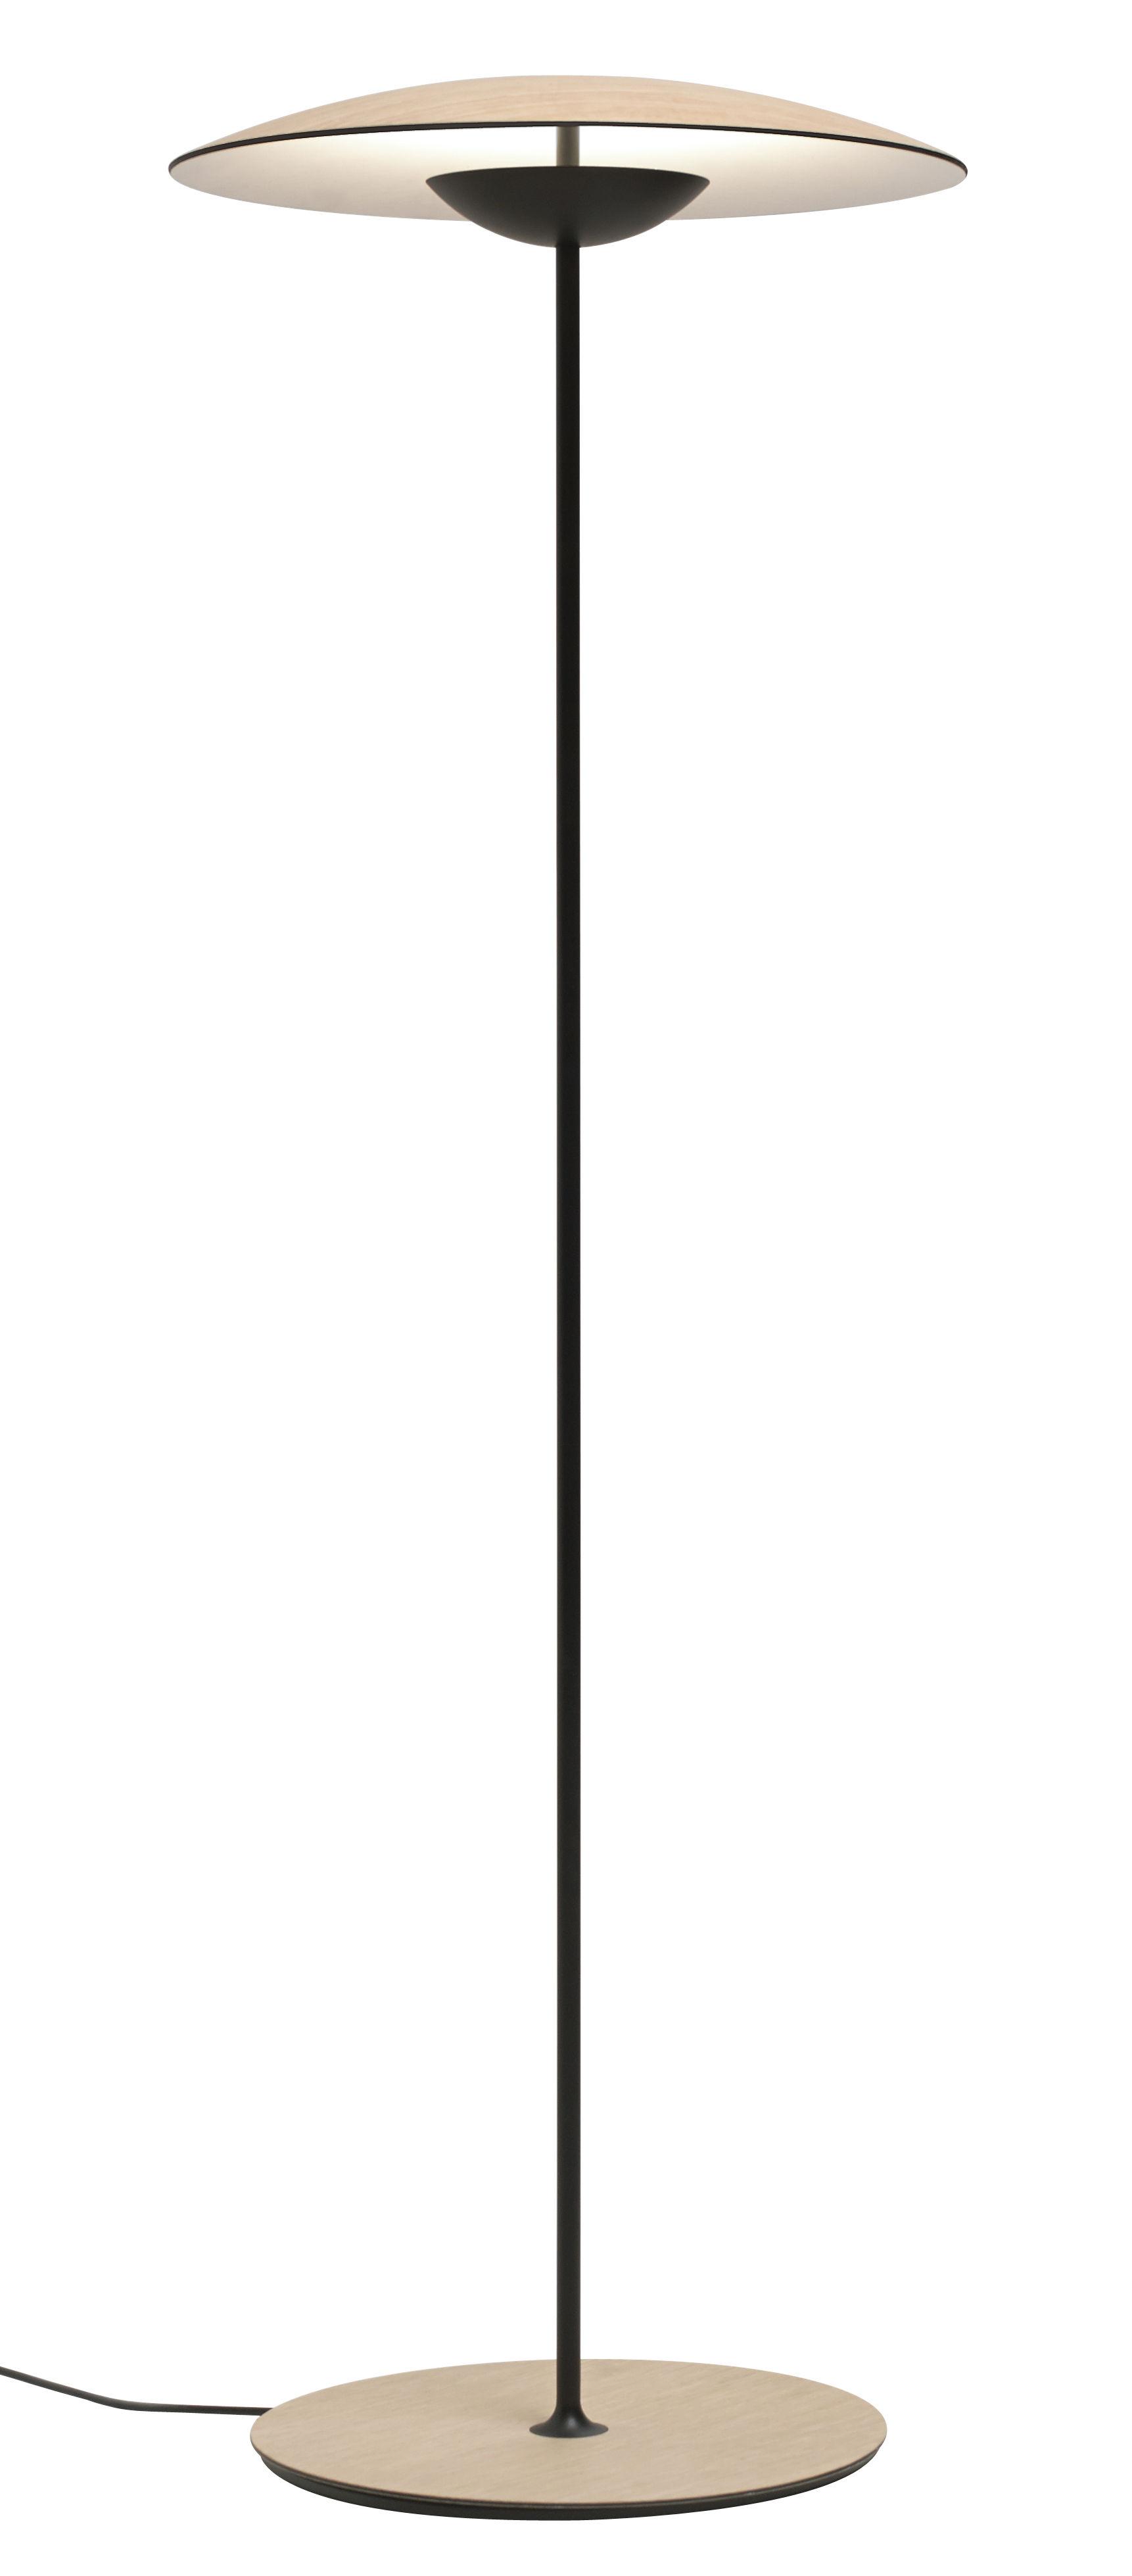 Lighting - Floor lamps - Ginger P Floor lamp by Marset - Oak / Black leg - Lacquered metal, Plywood